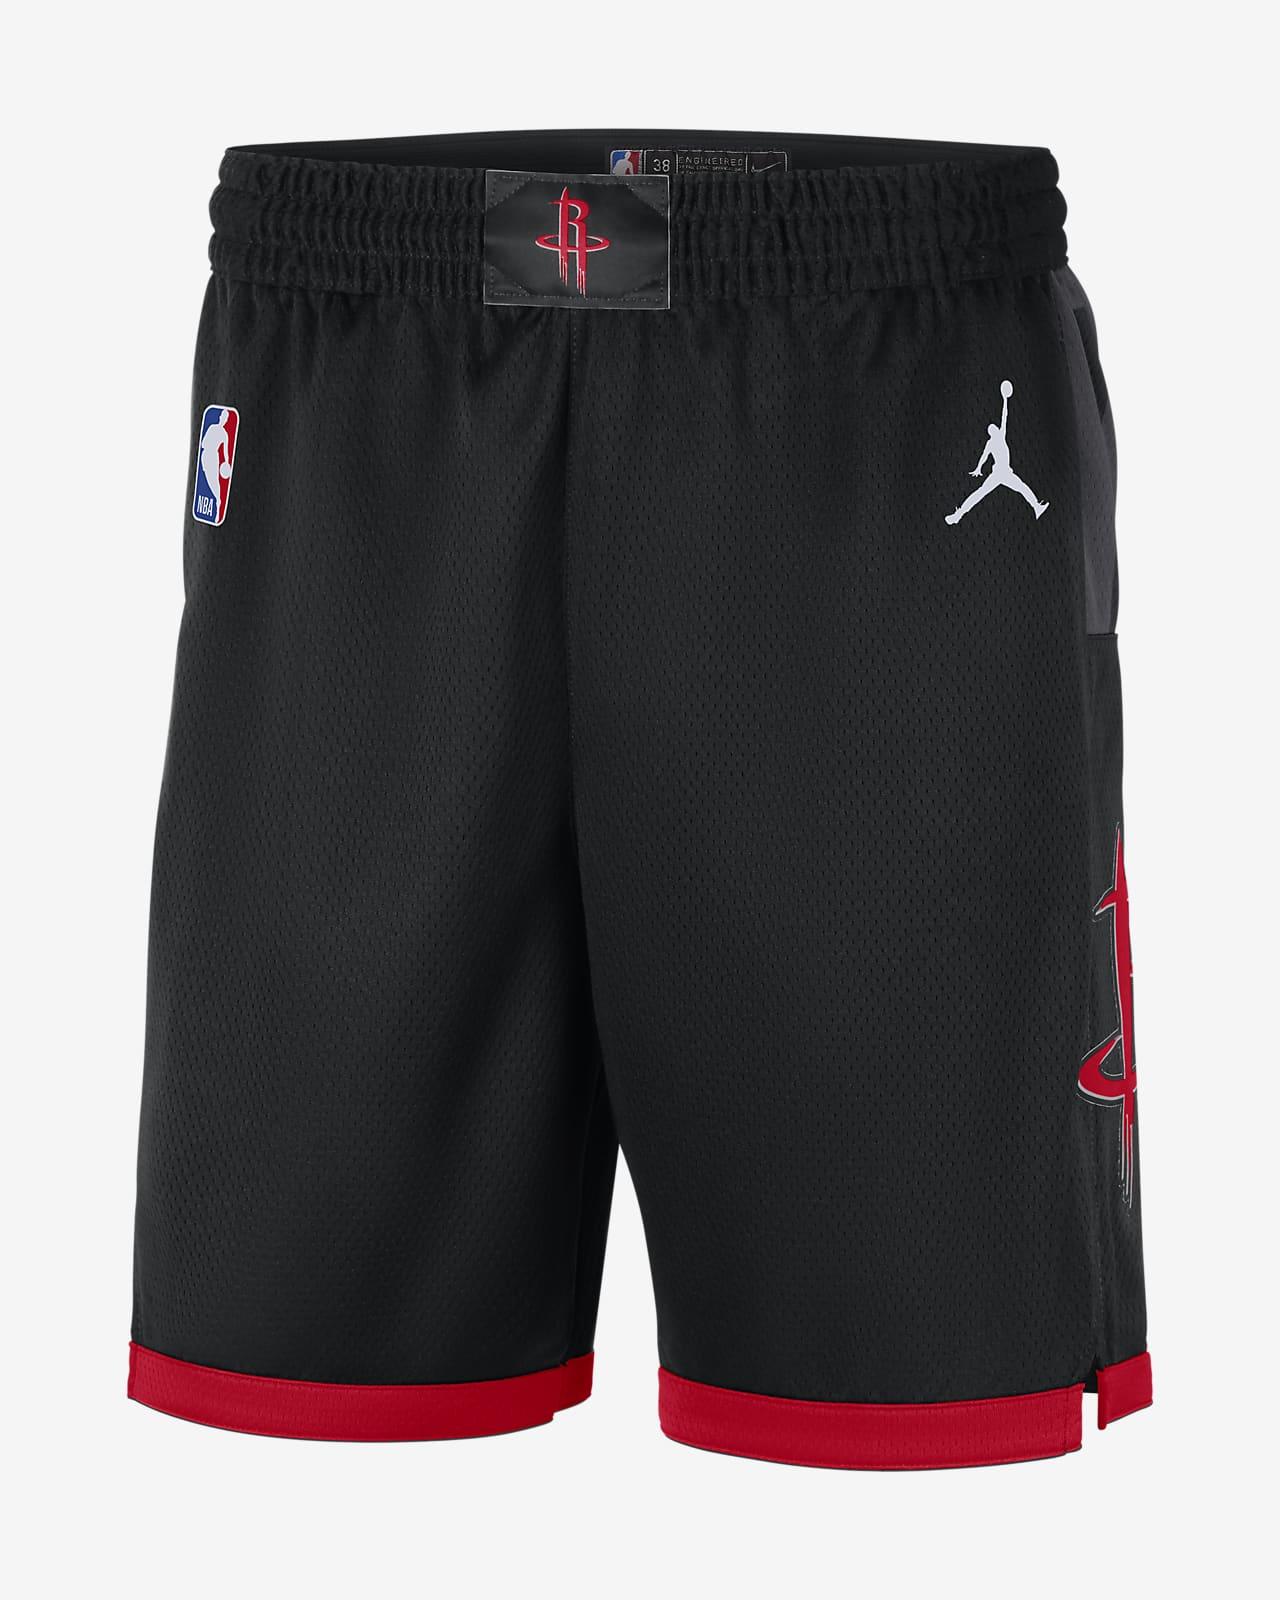 Short Jordan NBA Swingman Rockets Statement Edition 2020 pour Homme